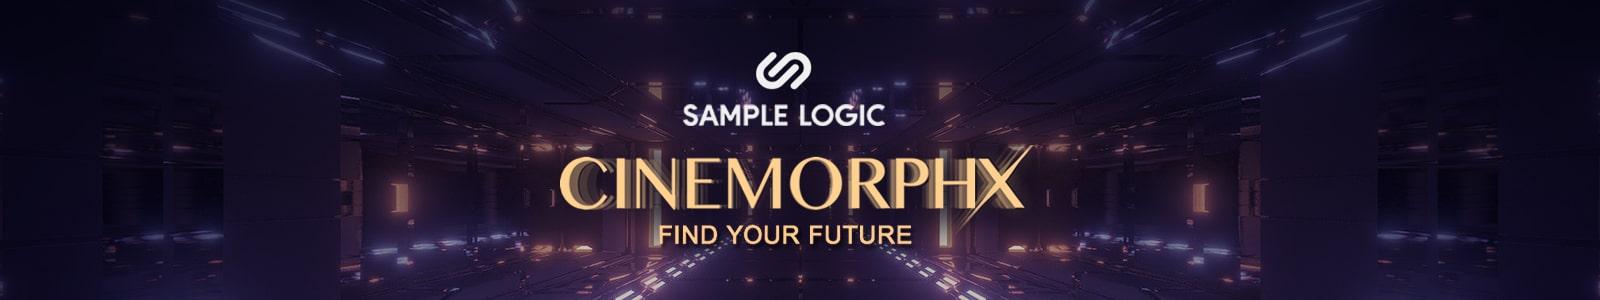 cinemorphx by sample logic